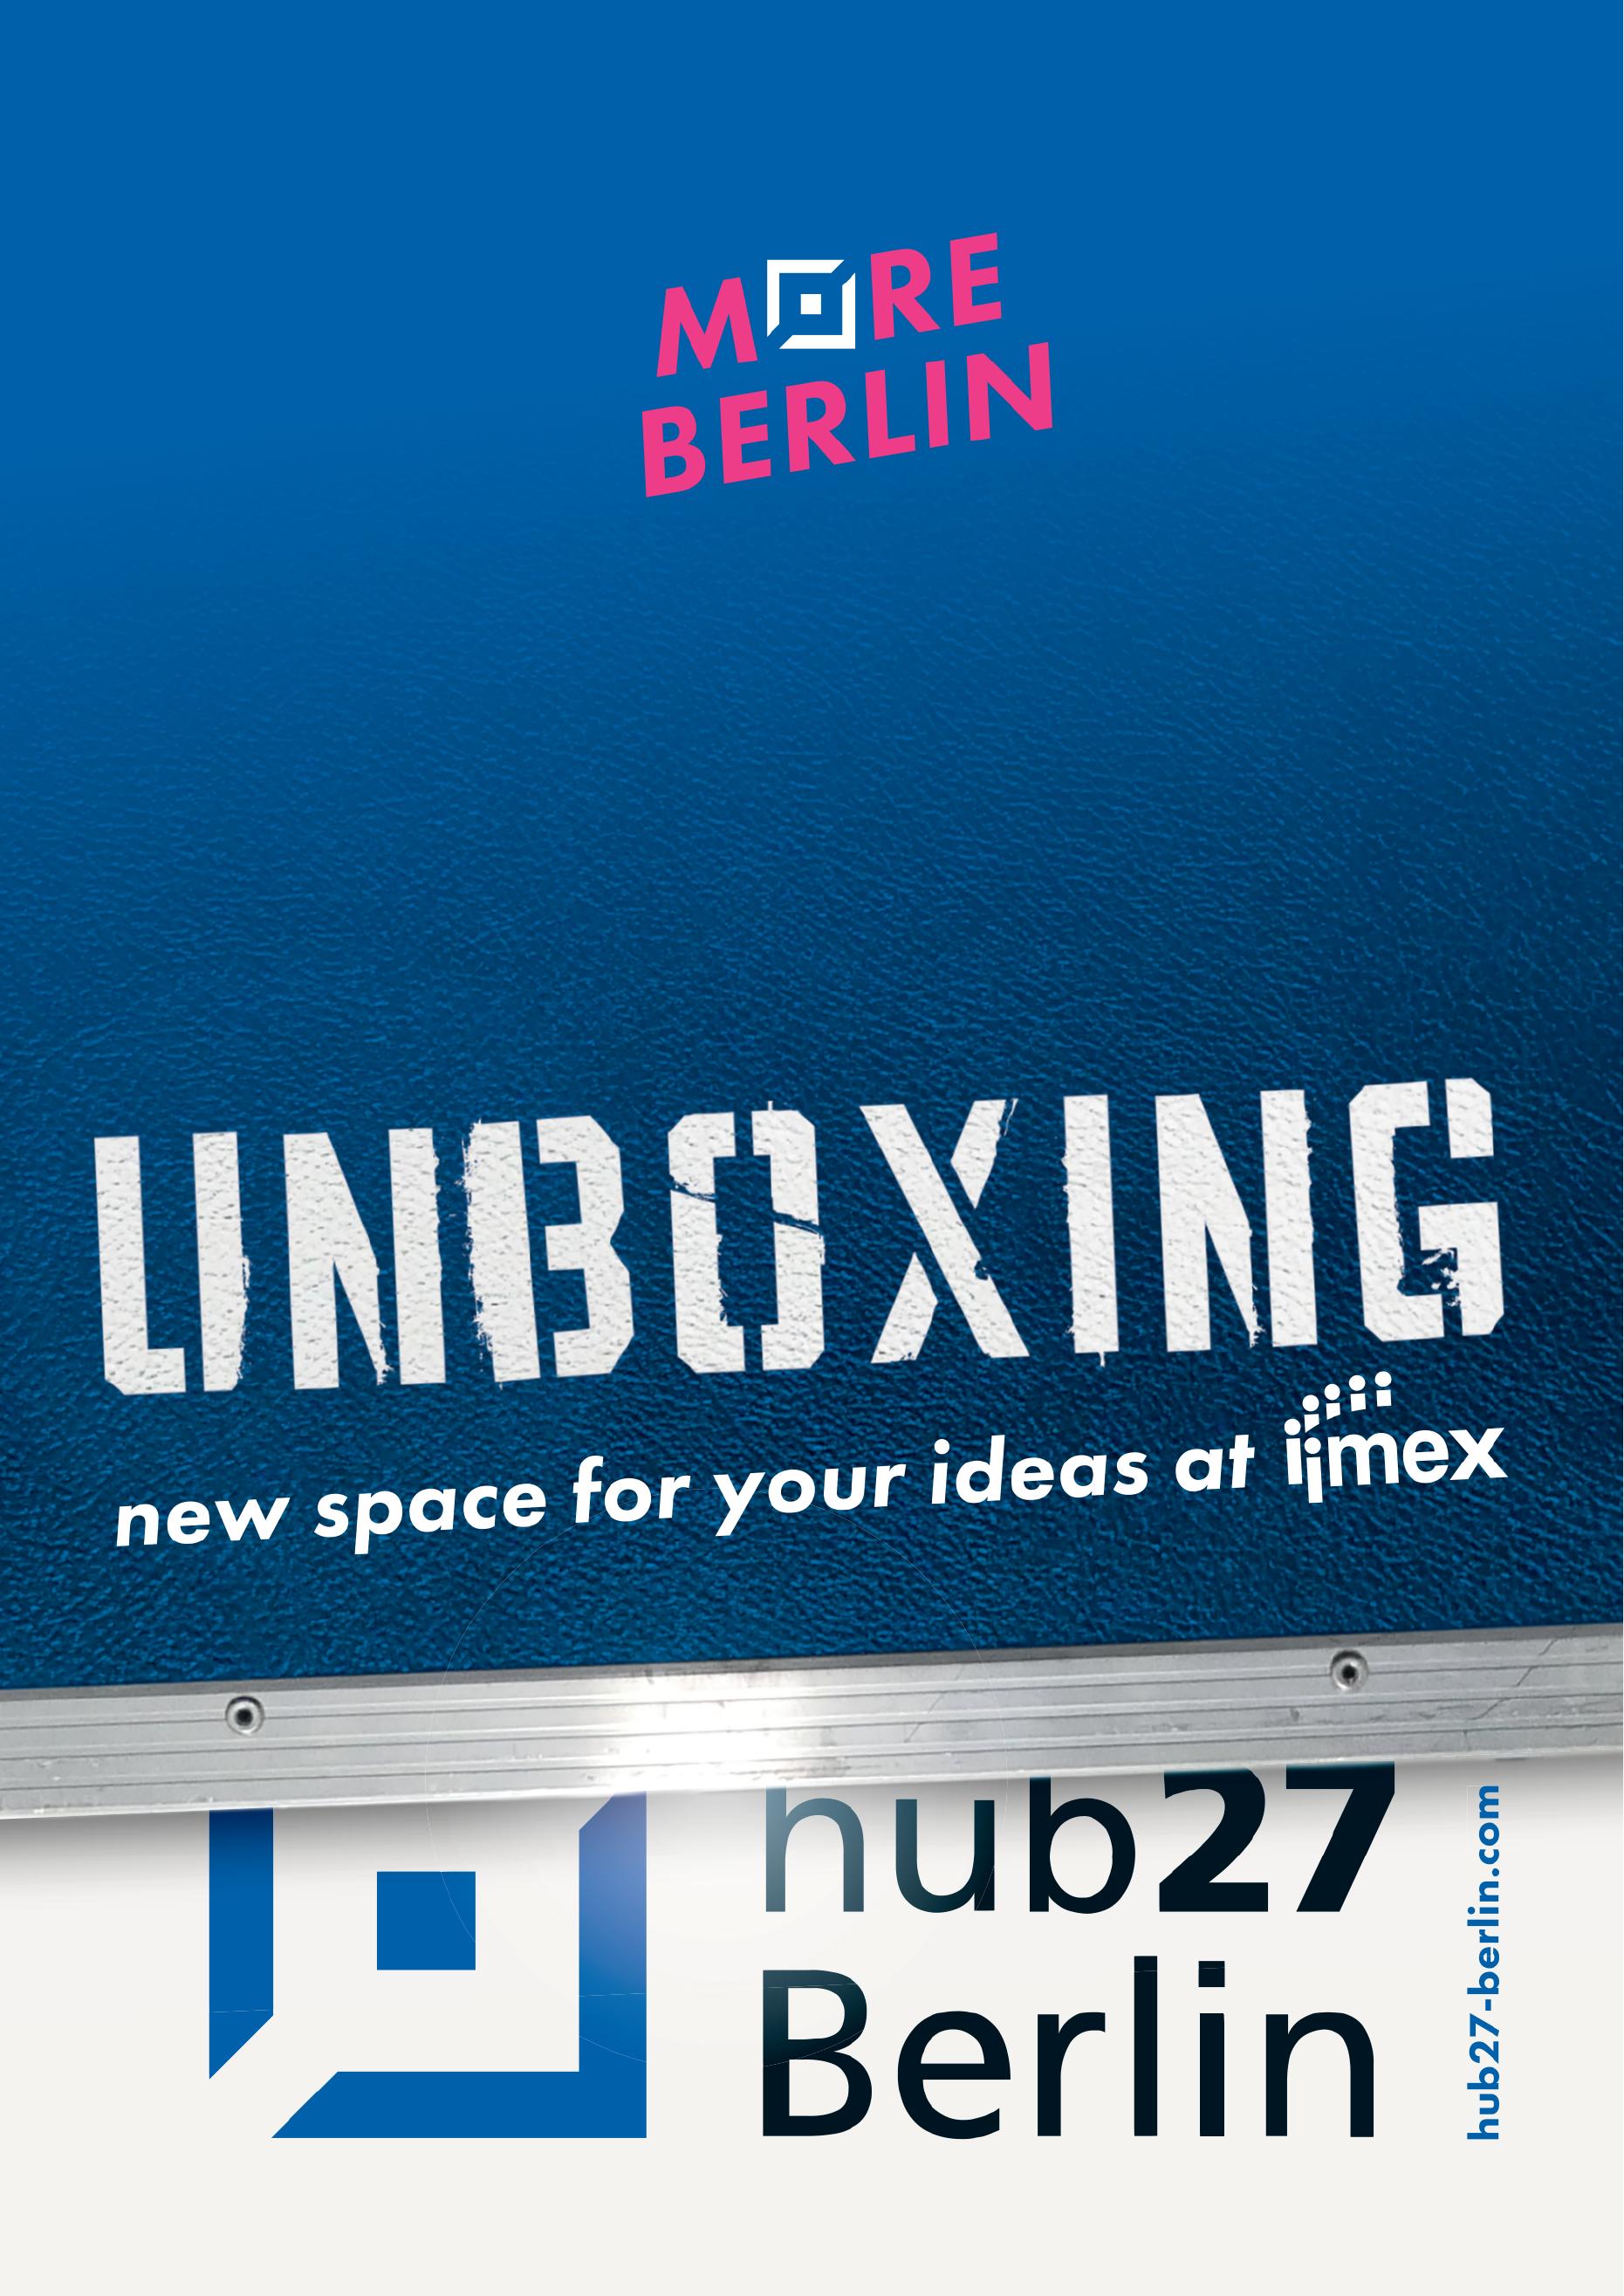 hub27 Berlin